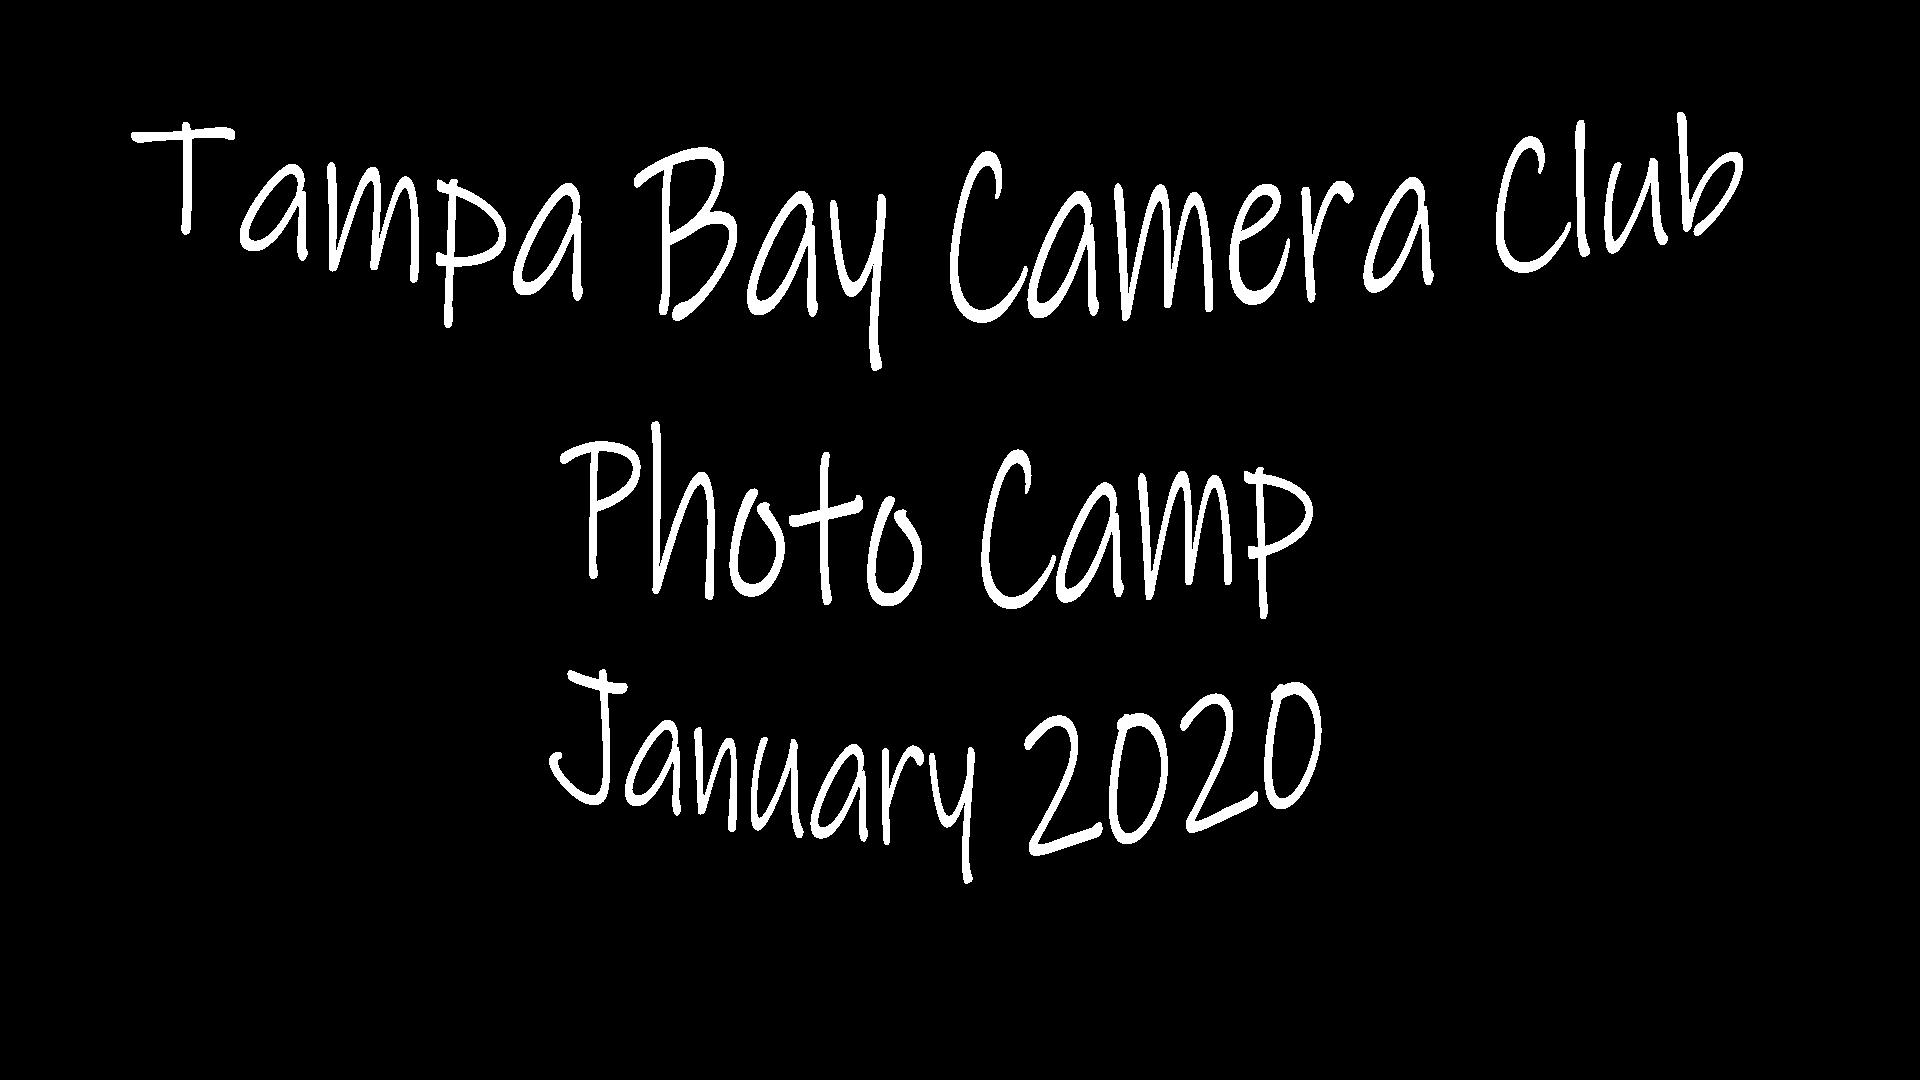 TBCC PC 2020 Title Slide.jpg